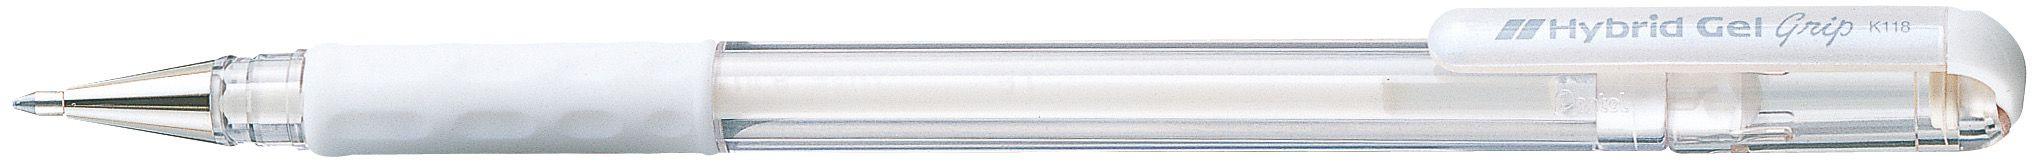 Caneta Hybrid Gel Grip Branca K118-LW